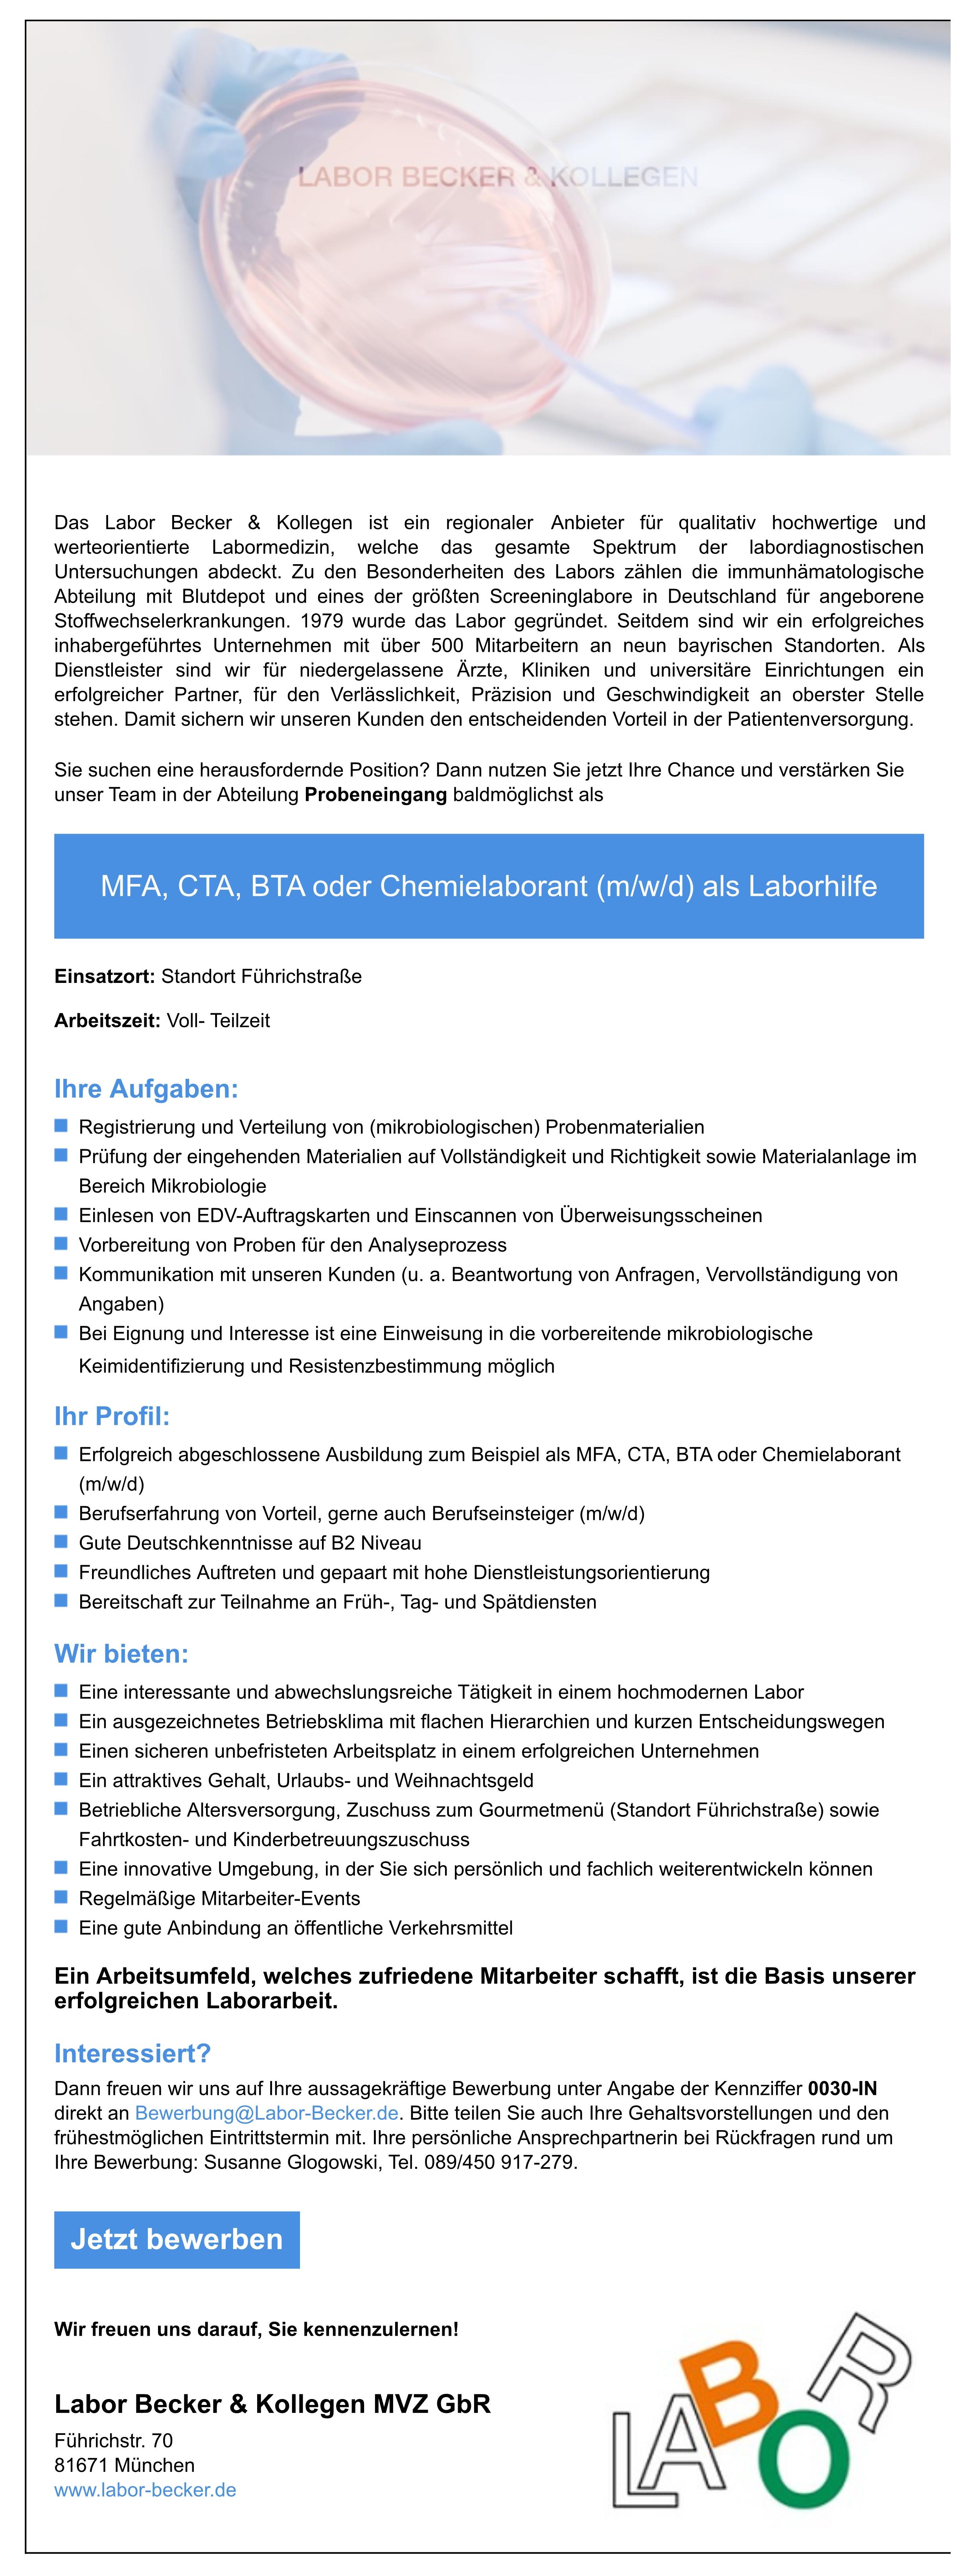 MFA, CTA, BTA oder Chemielaborant (m/w/d) als Laborhilfe